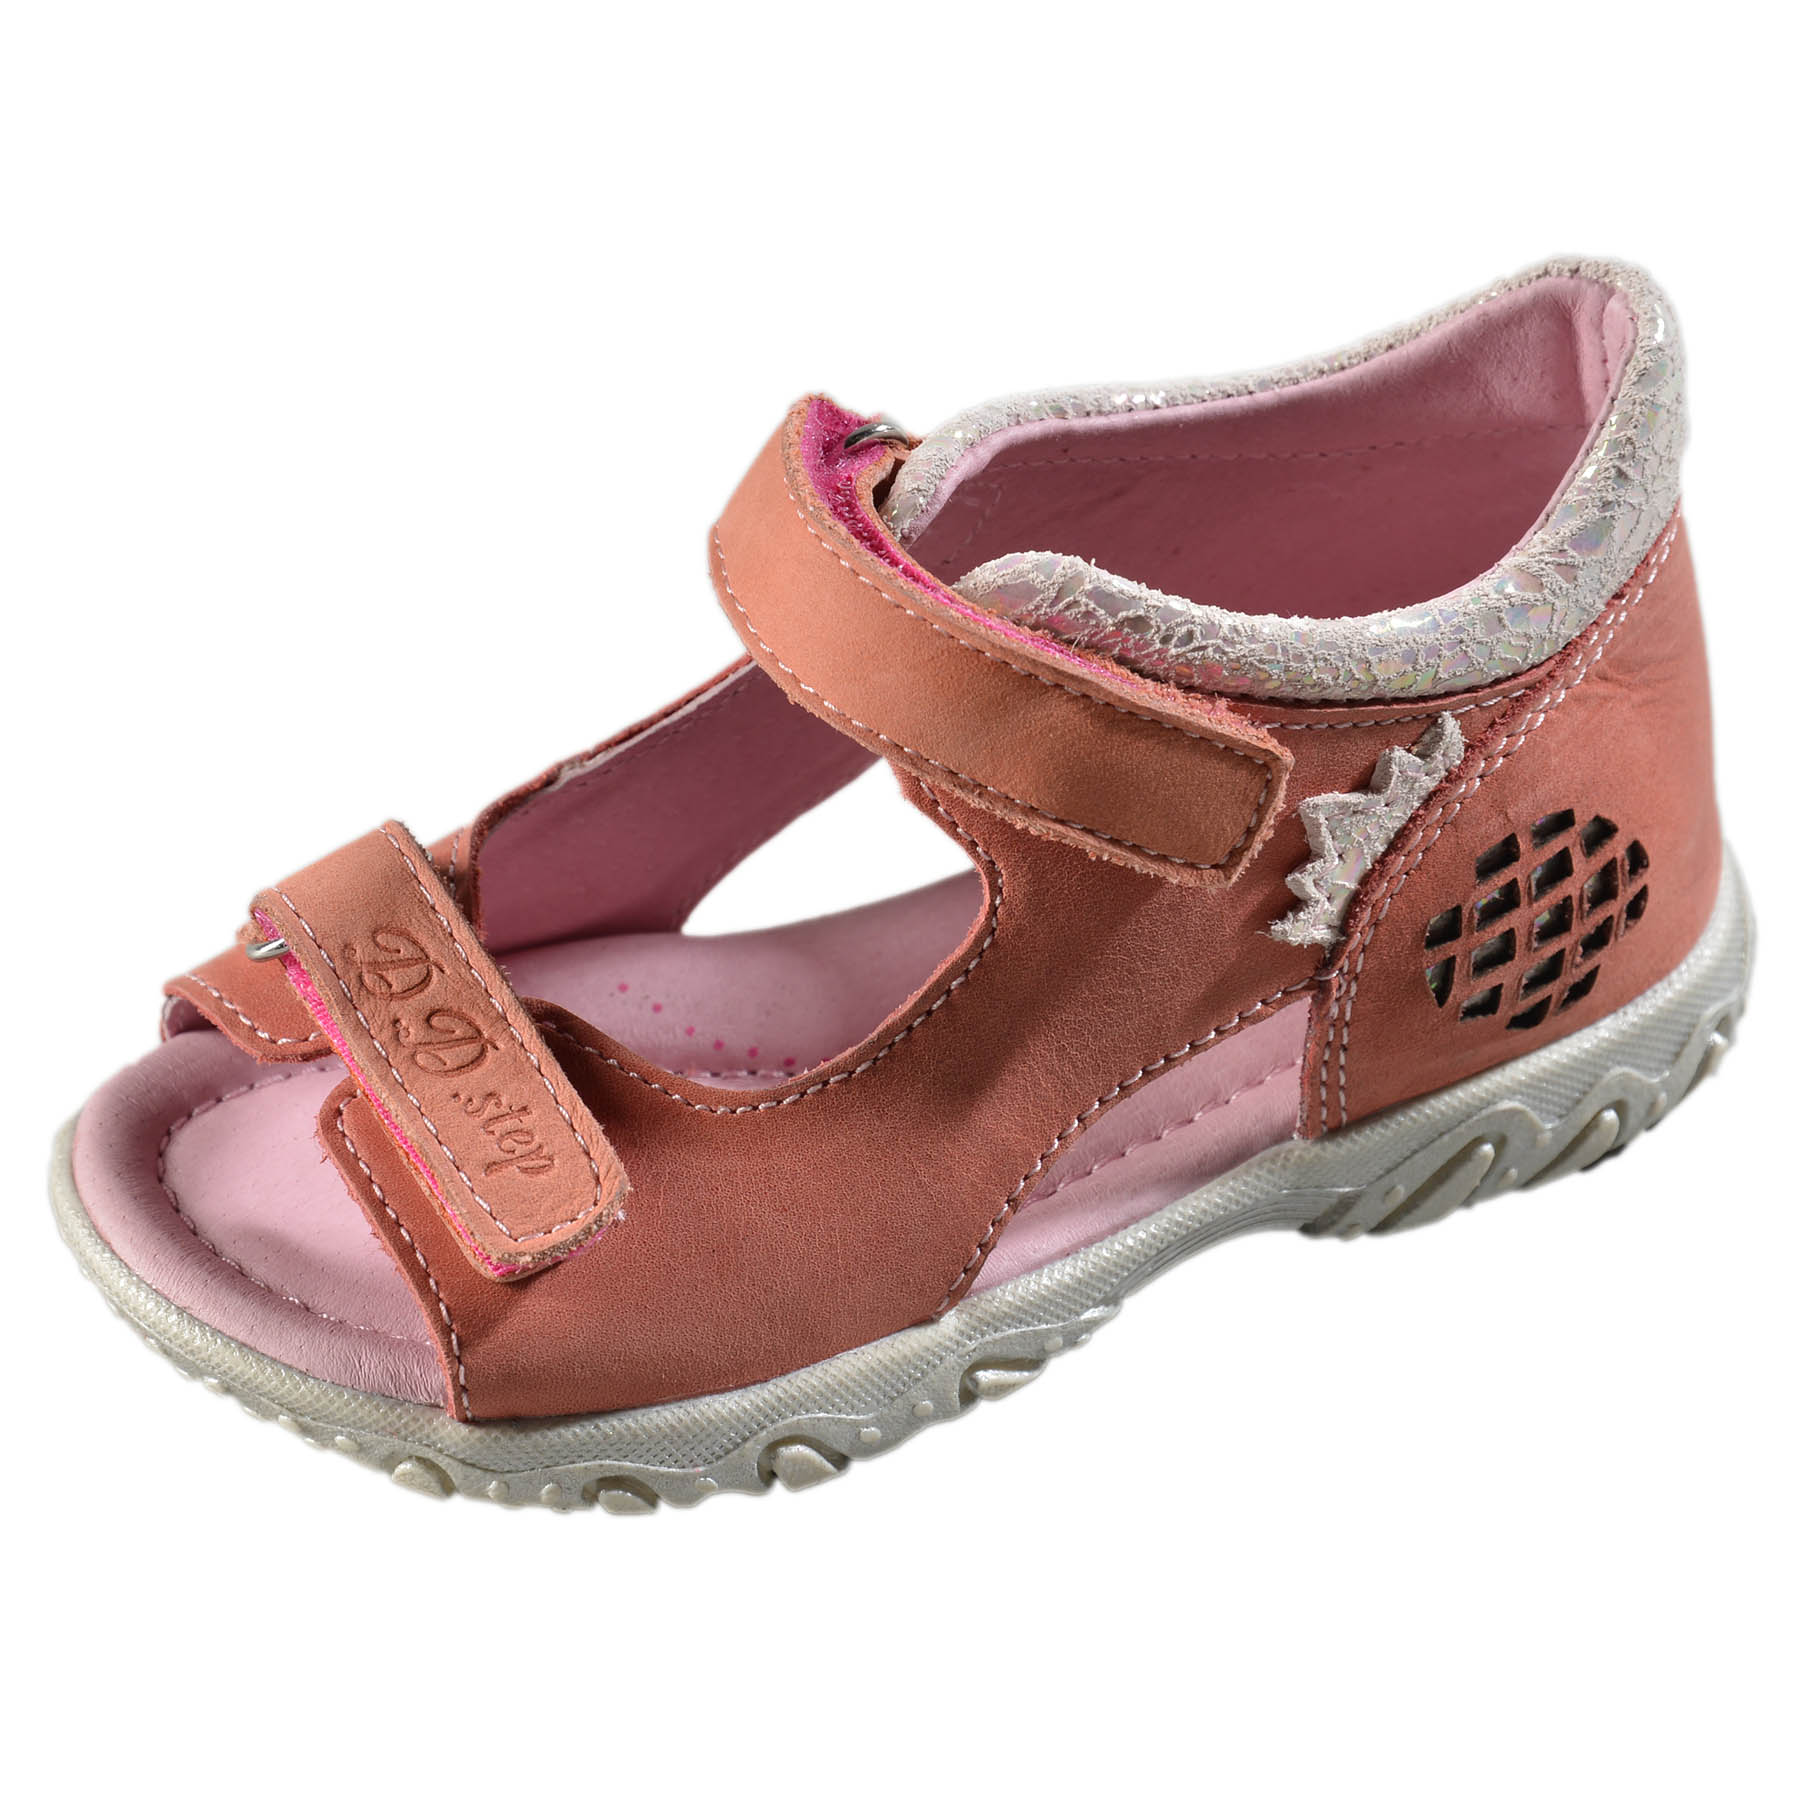 e71aa7630a91 Dievčenské kožené sandále-Pink DDstep - AC625-5014AM